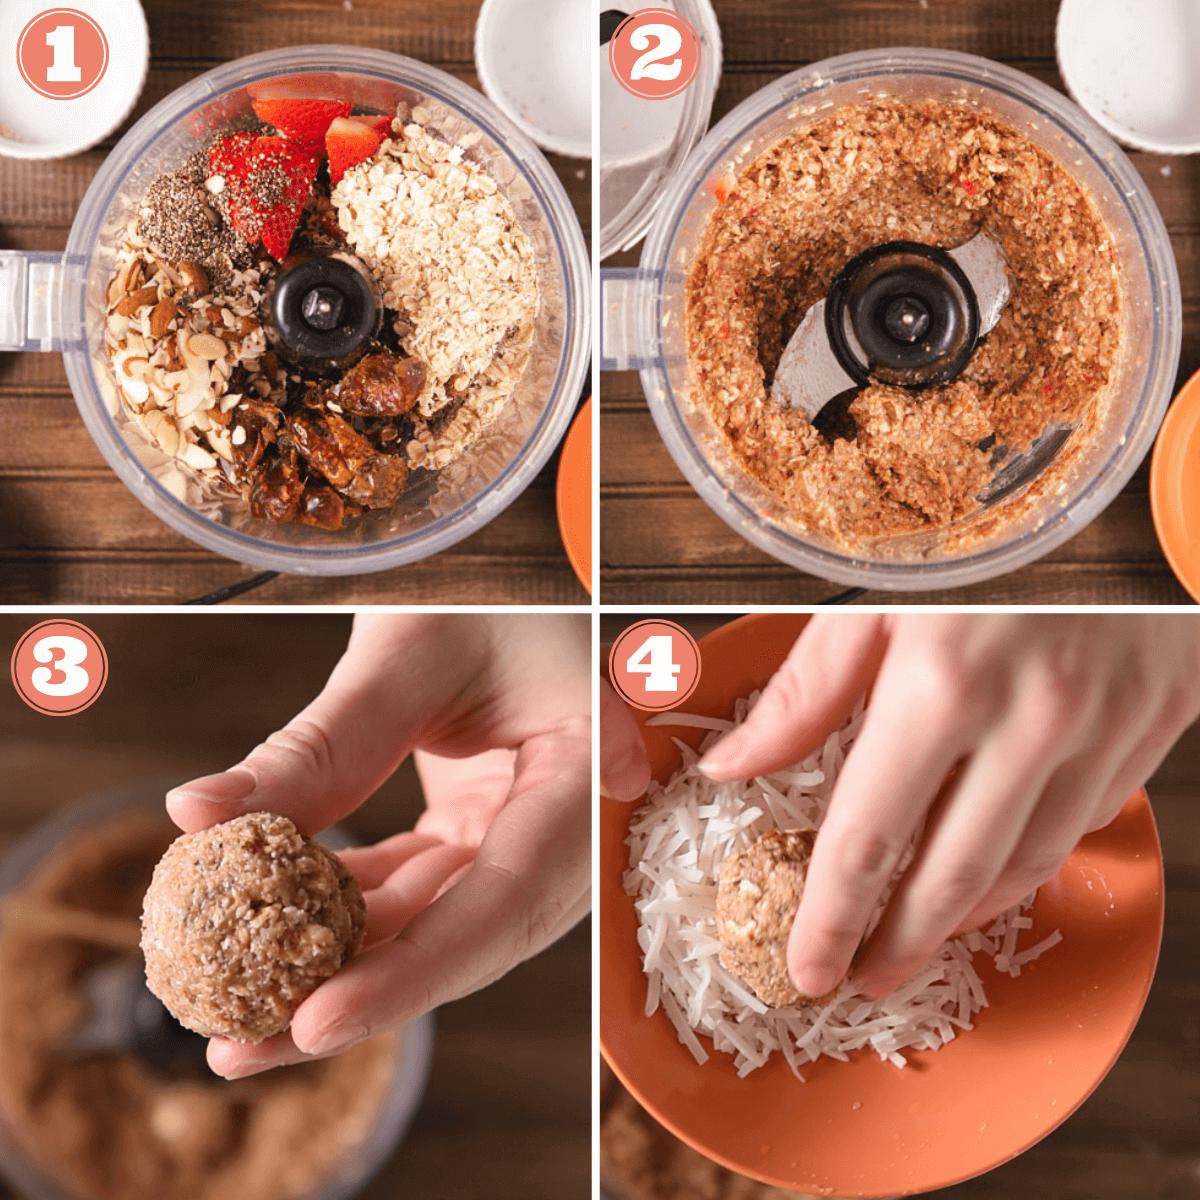 Steps 1 through 4 to make energy balls